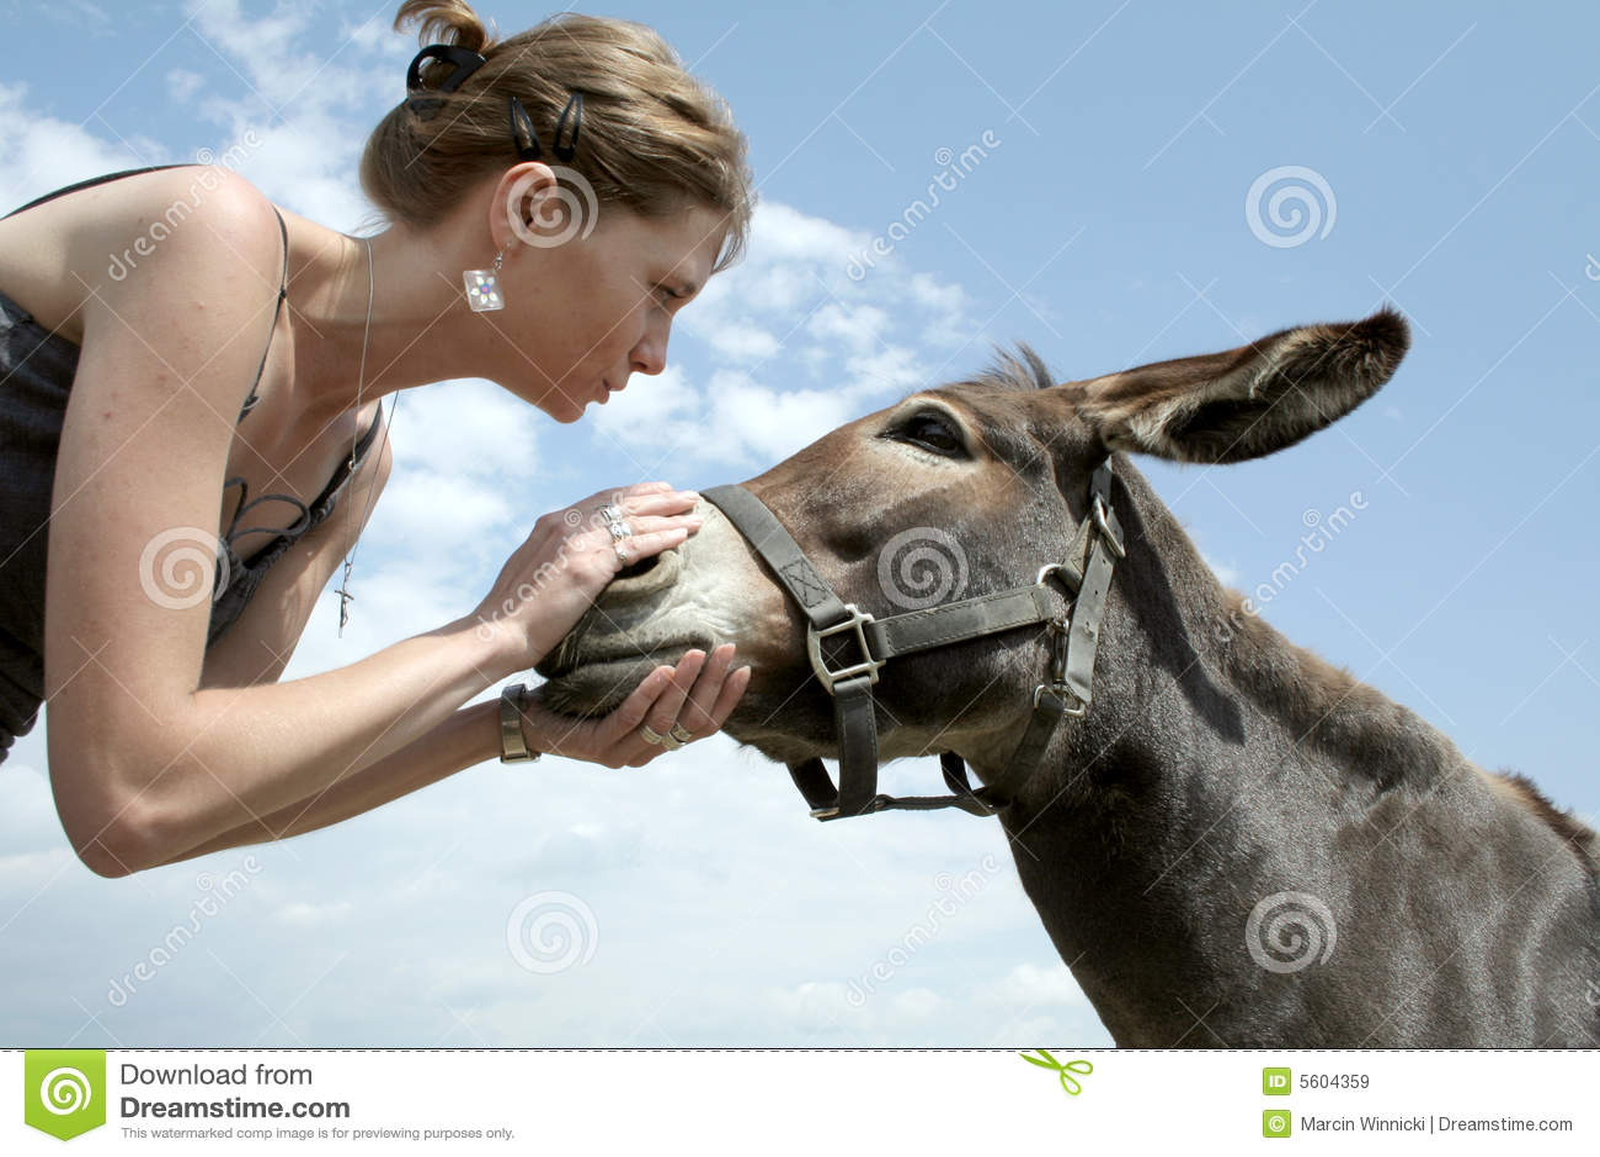 Woman Talking To Donkey Royalty Free Stock Images - Image: 5604359